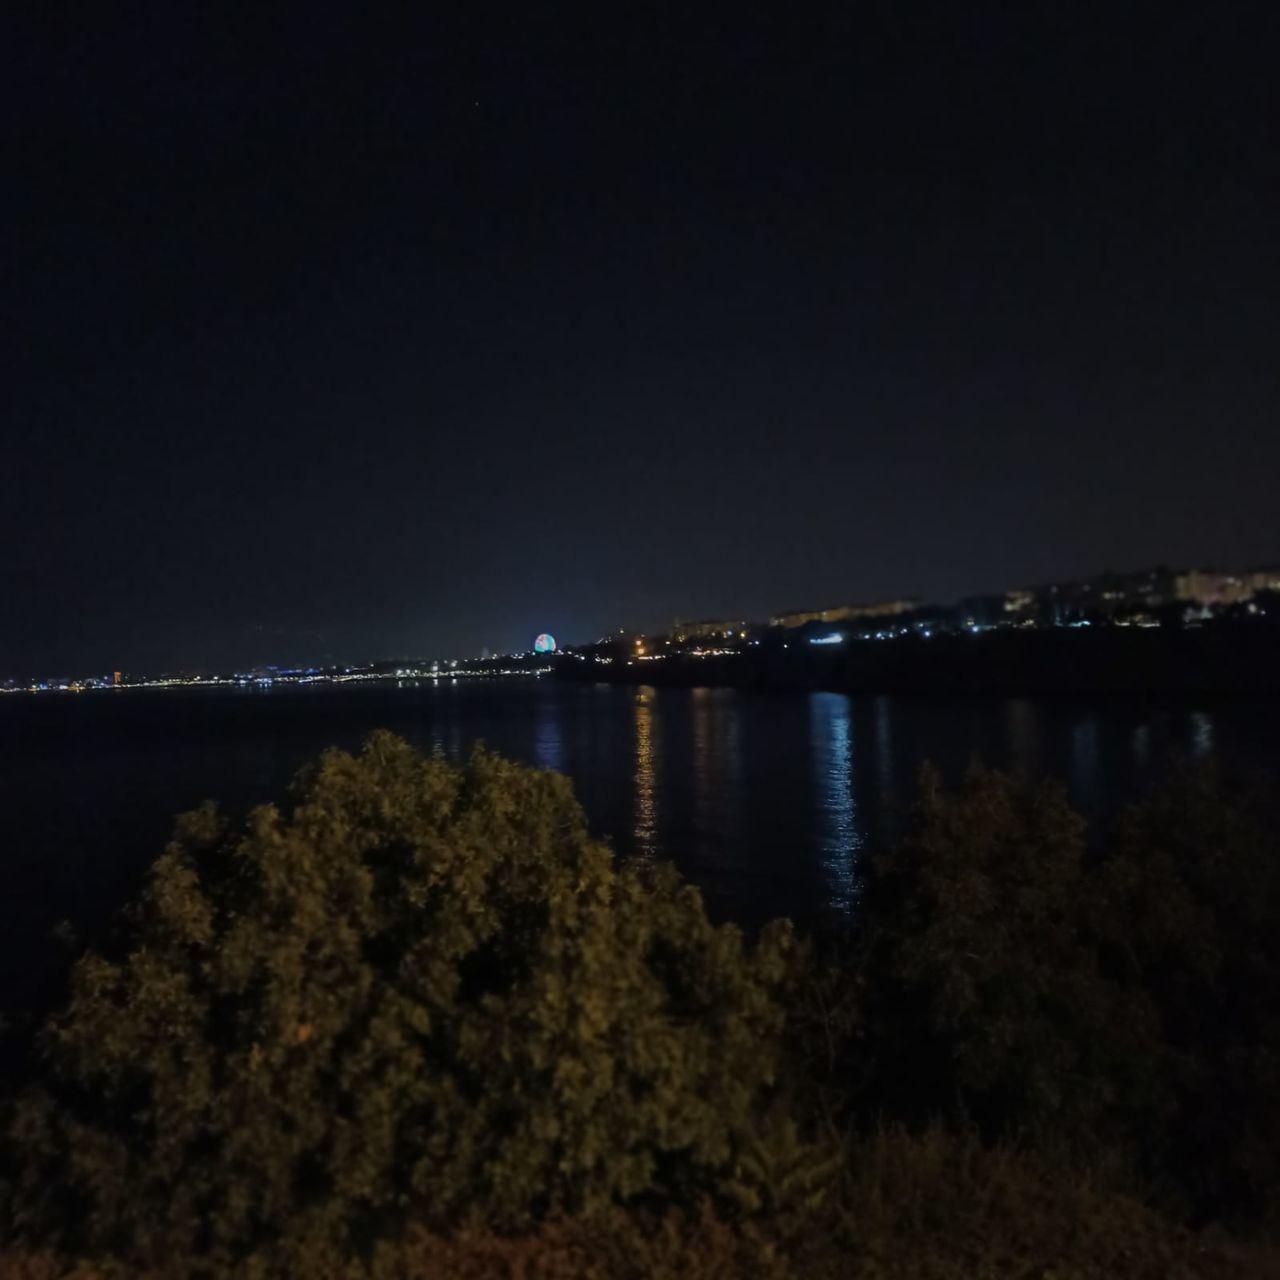 SEA BY ILLUMINATED CITY AGAINST SKY AT NIGHT